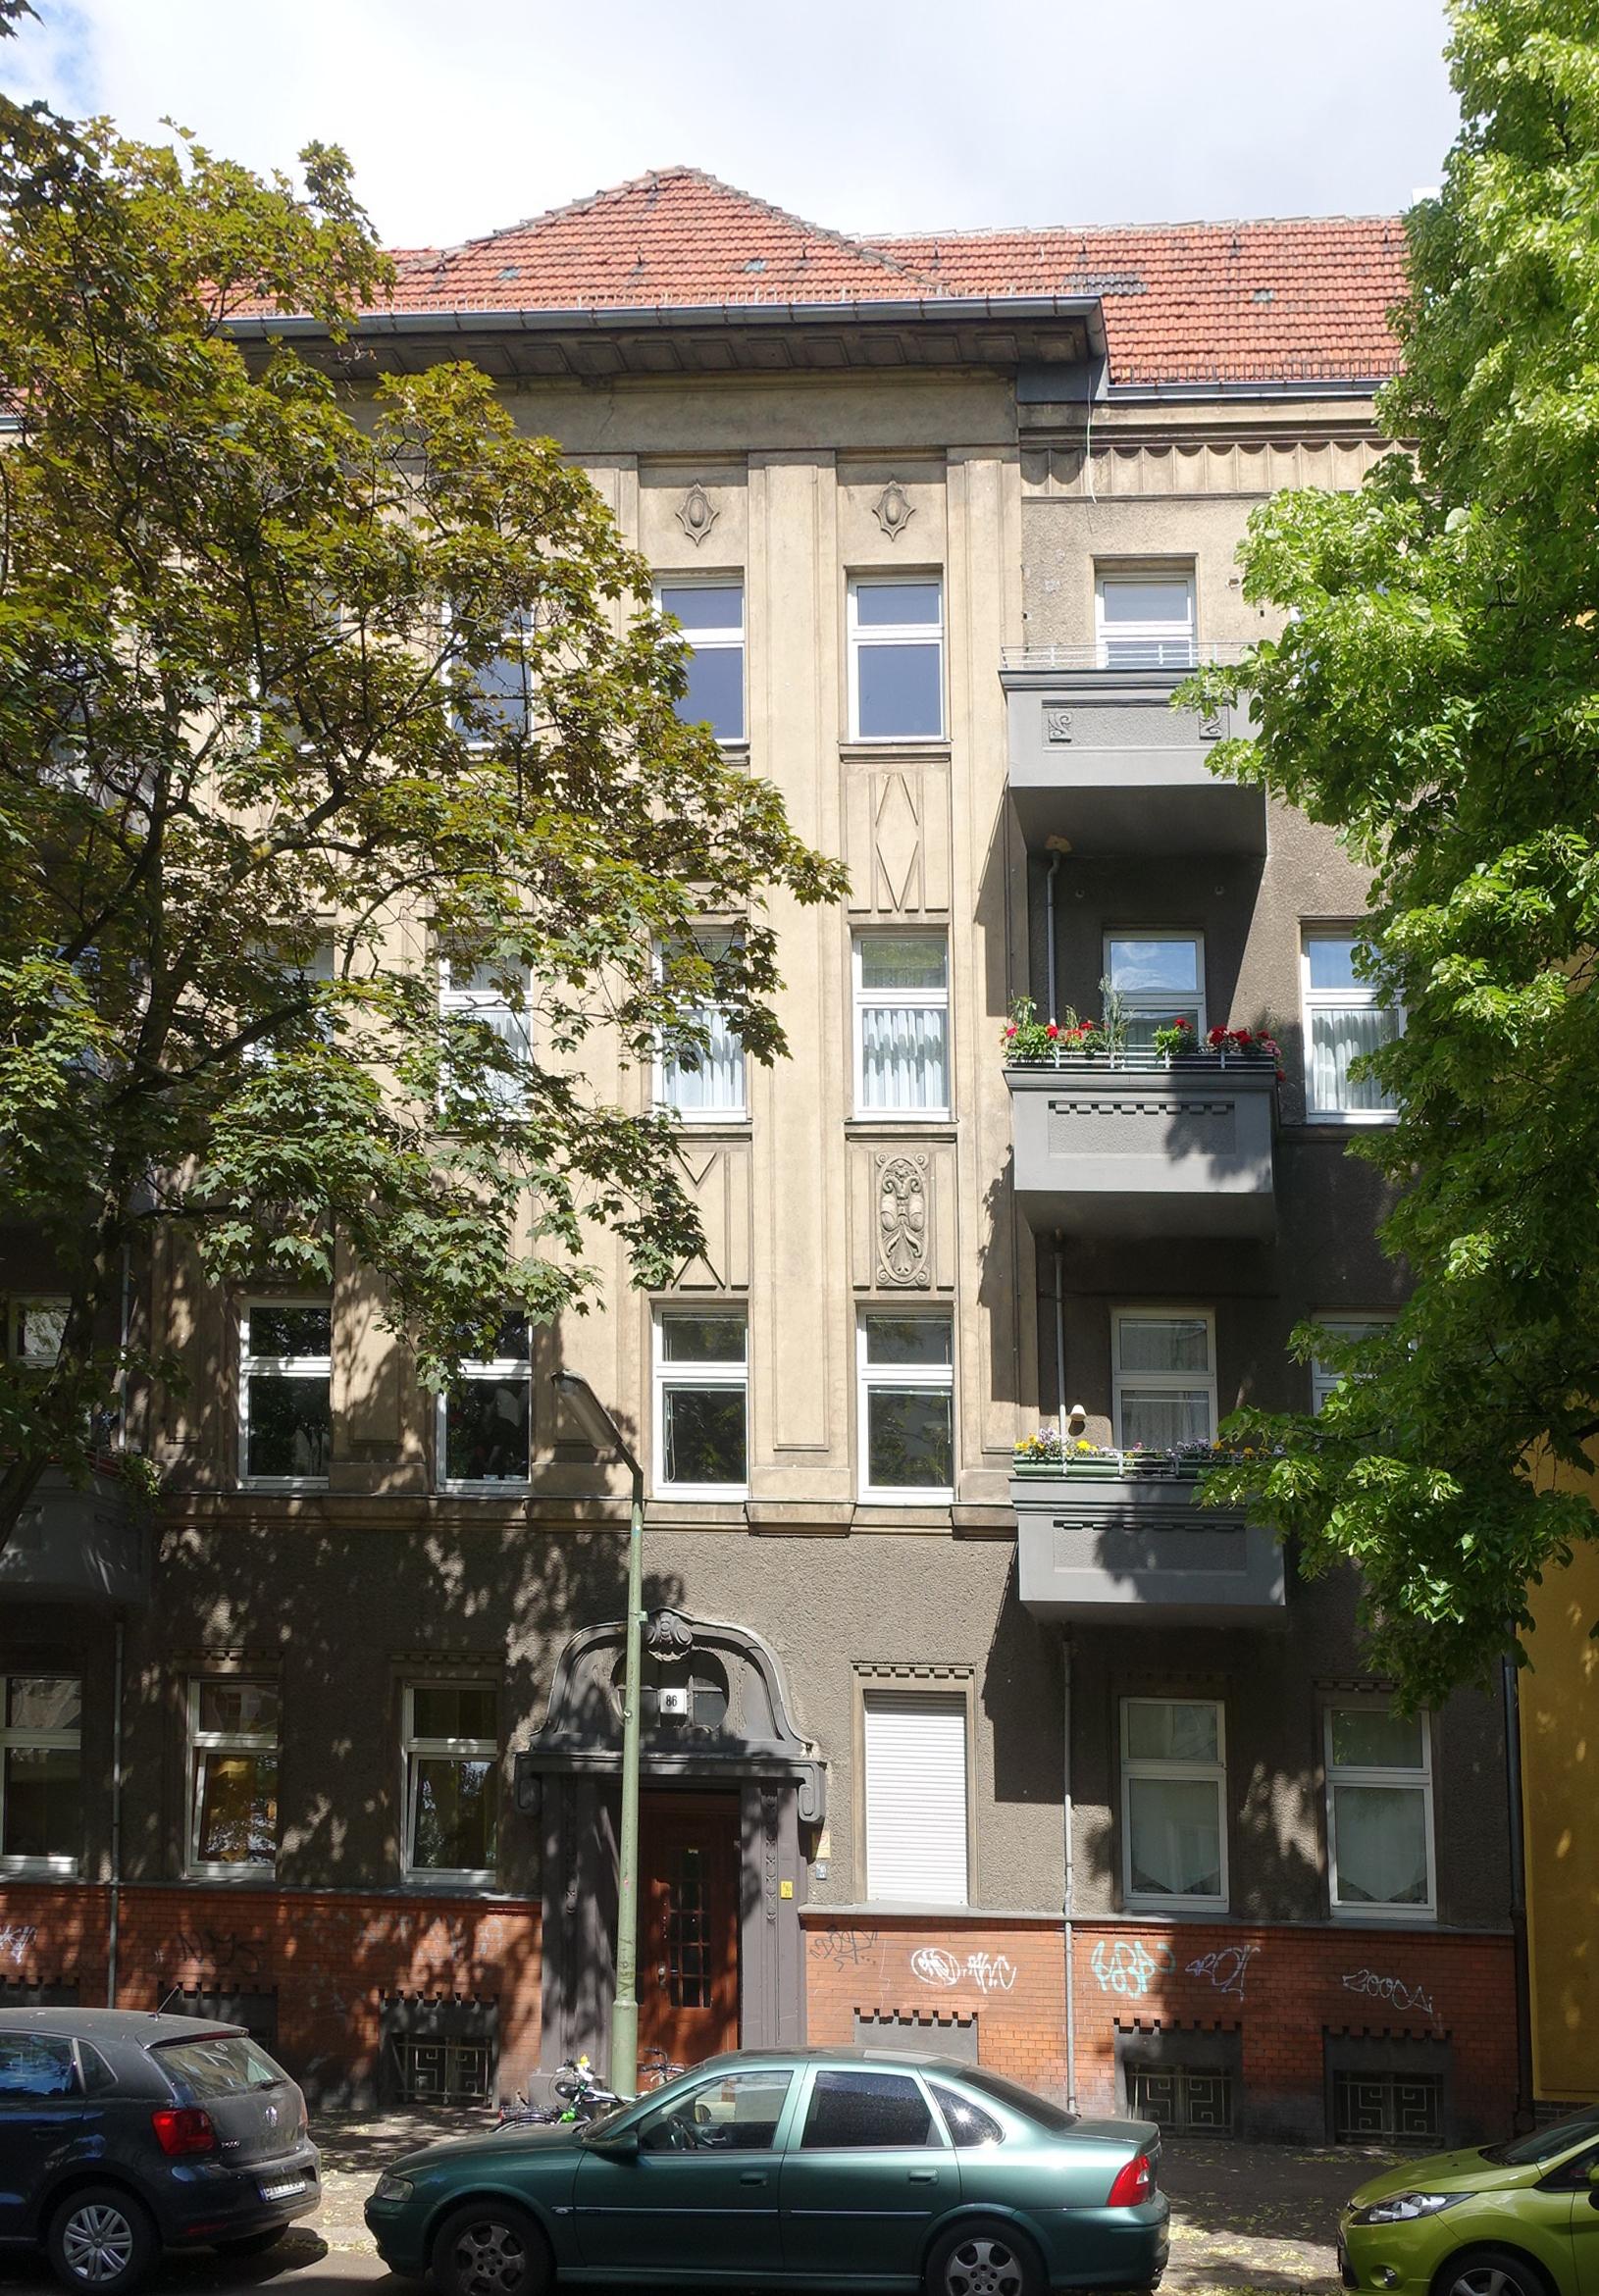 file friedrich wilhelm stra e 86 berlin reinickendorf jpg wikimedia commons. Black Bedroom Furniture Sets. Home Design Ideas